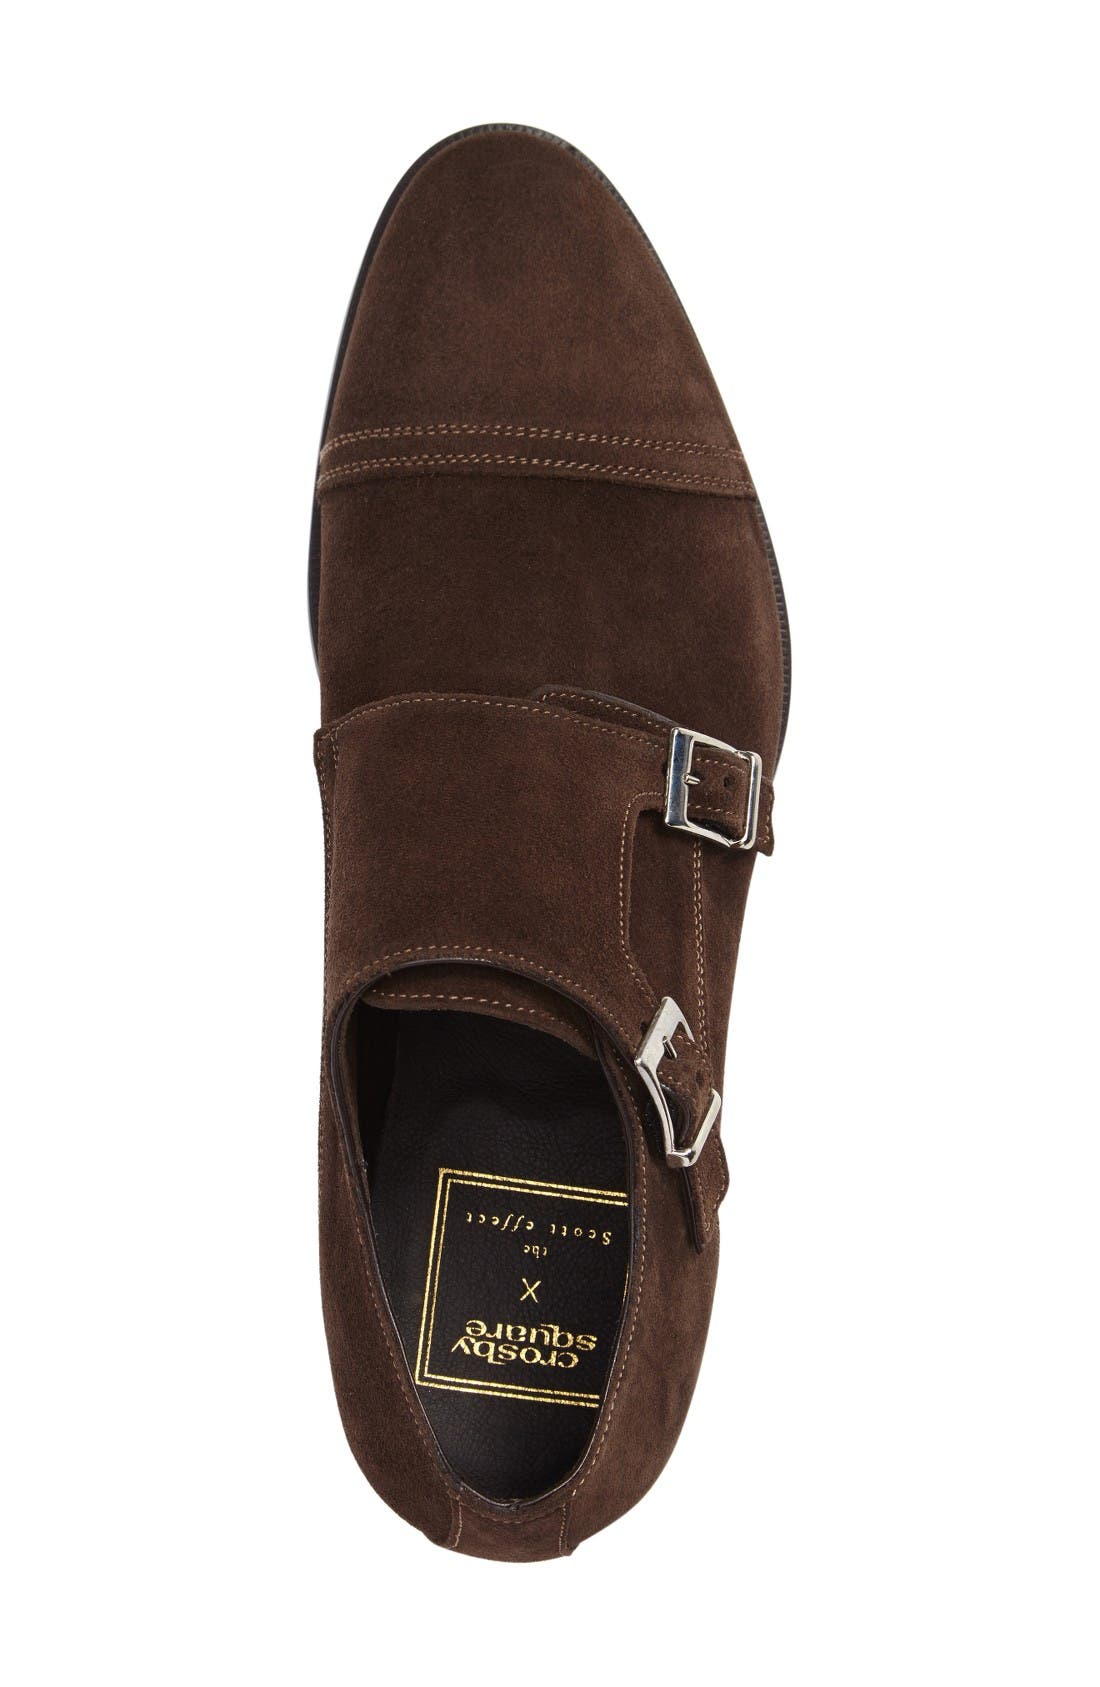 Alternate Image 3  - Crosby Square Conley Double Monk Strap Shoe (Men)